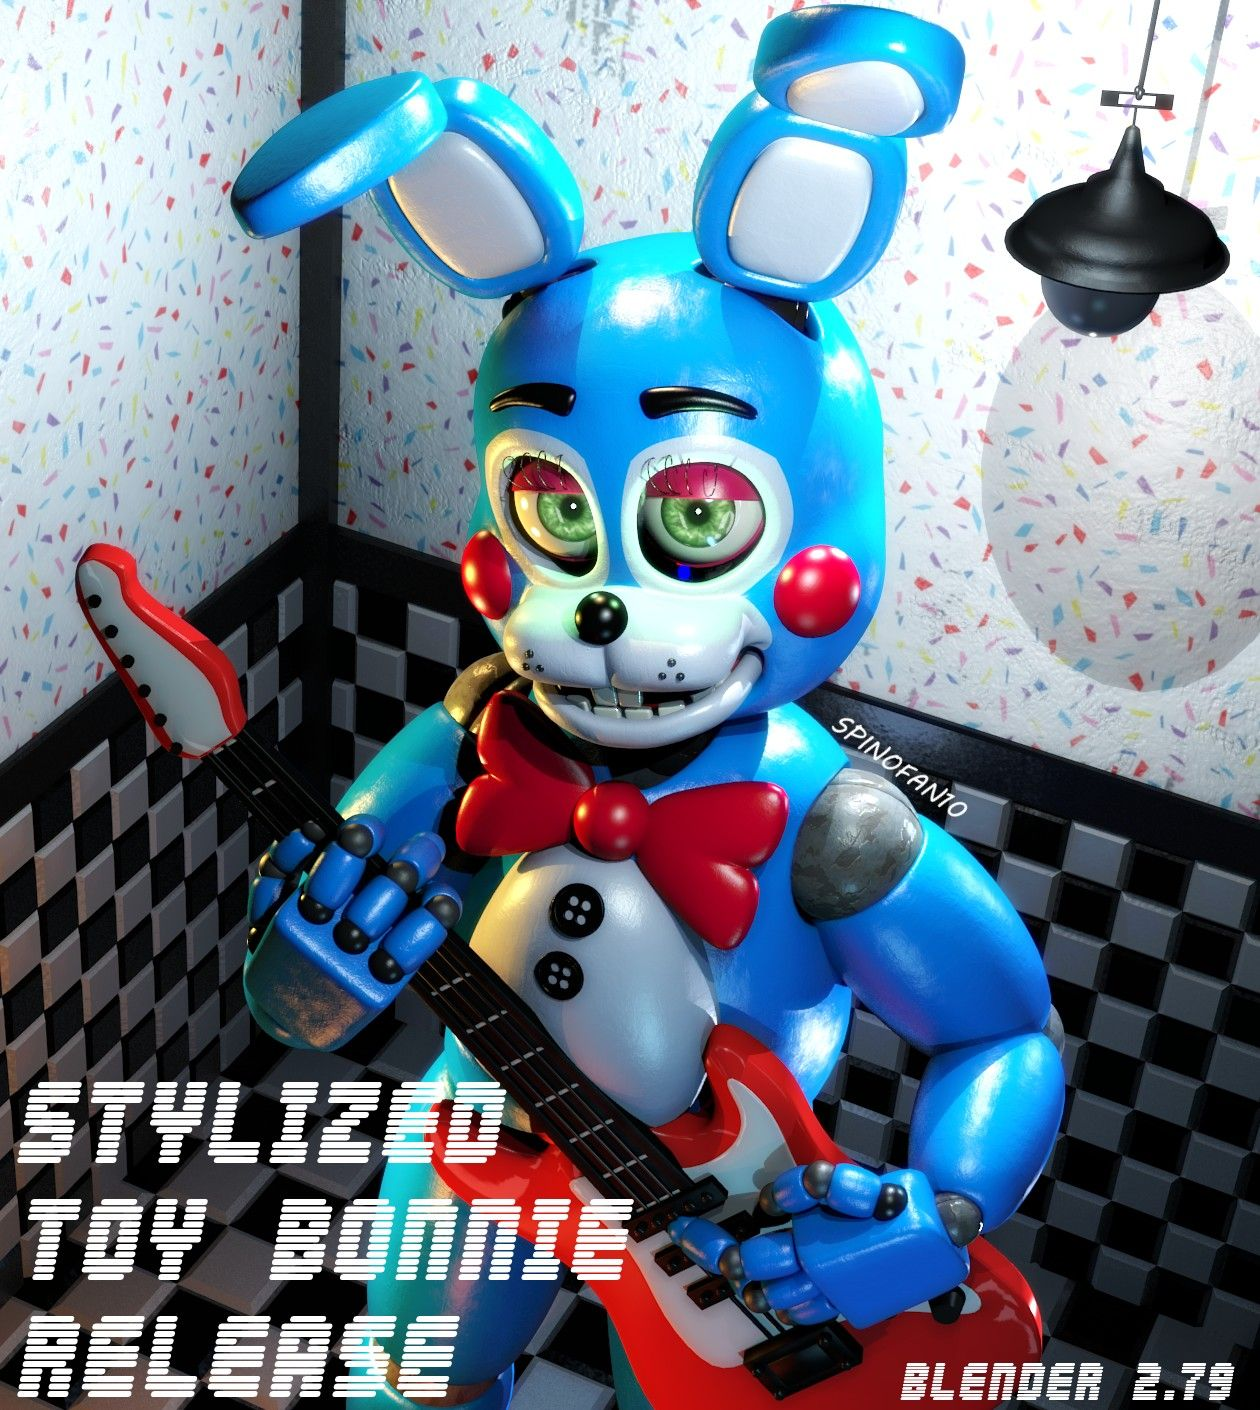 Stylized Toy Bonnie Release Anime Fnaf Fnaf Drawings Fnaf Wallpapers